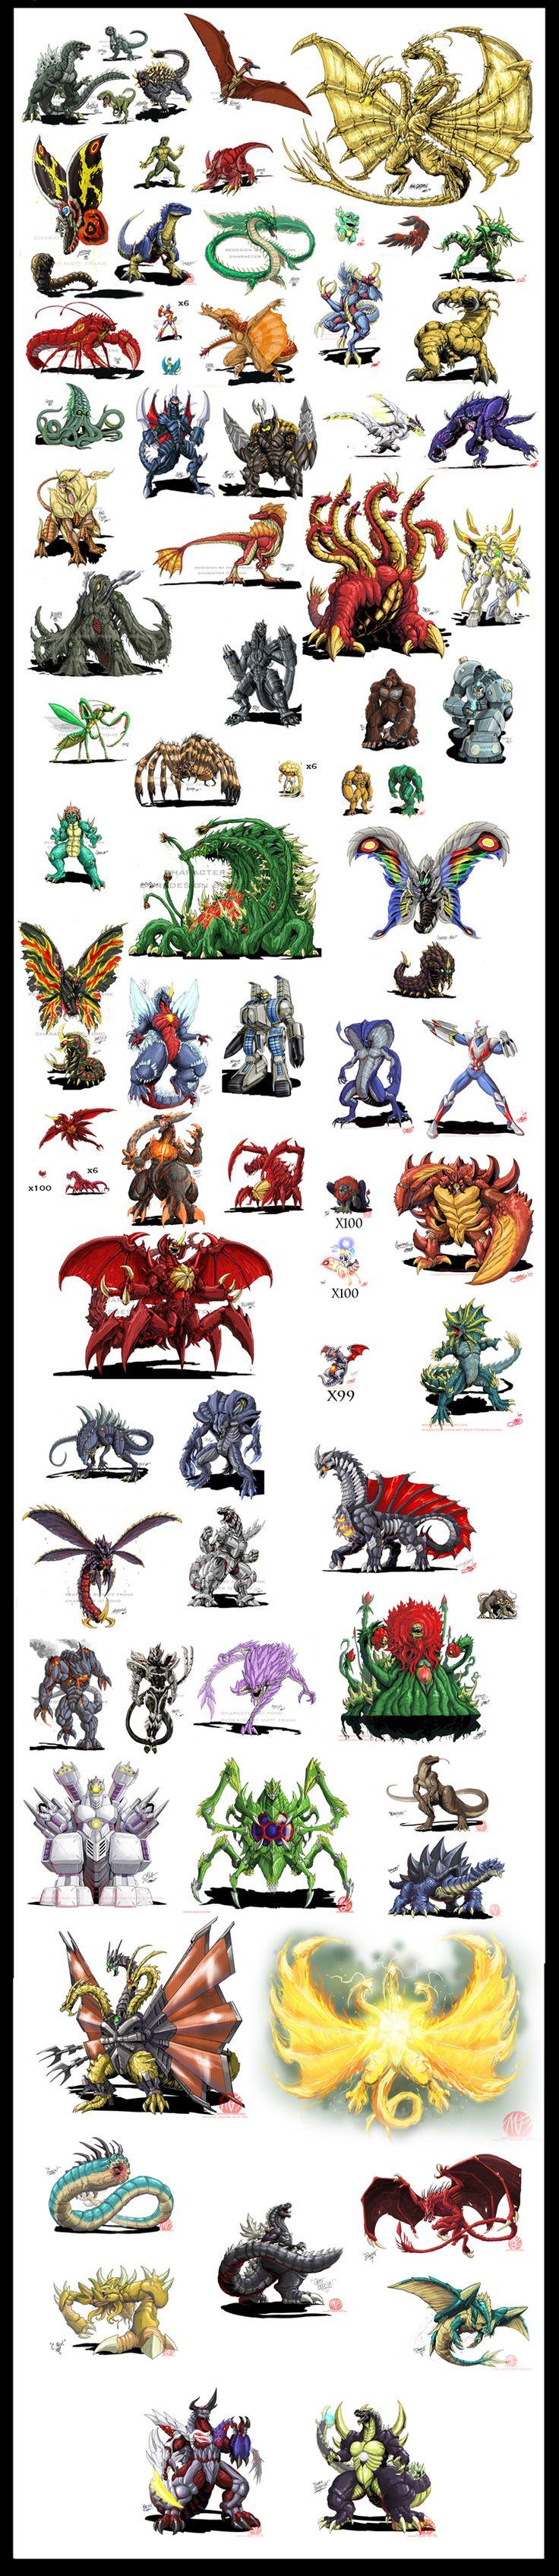 454 best monsters images on pinterest jurassic park creature